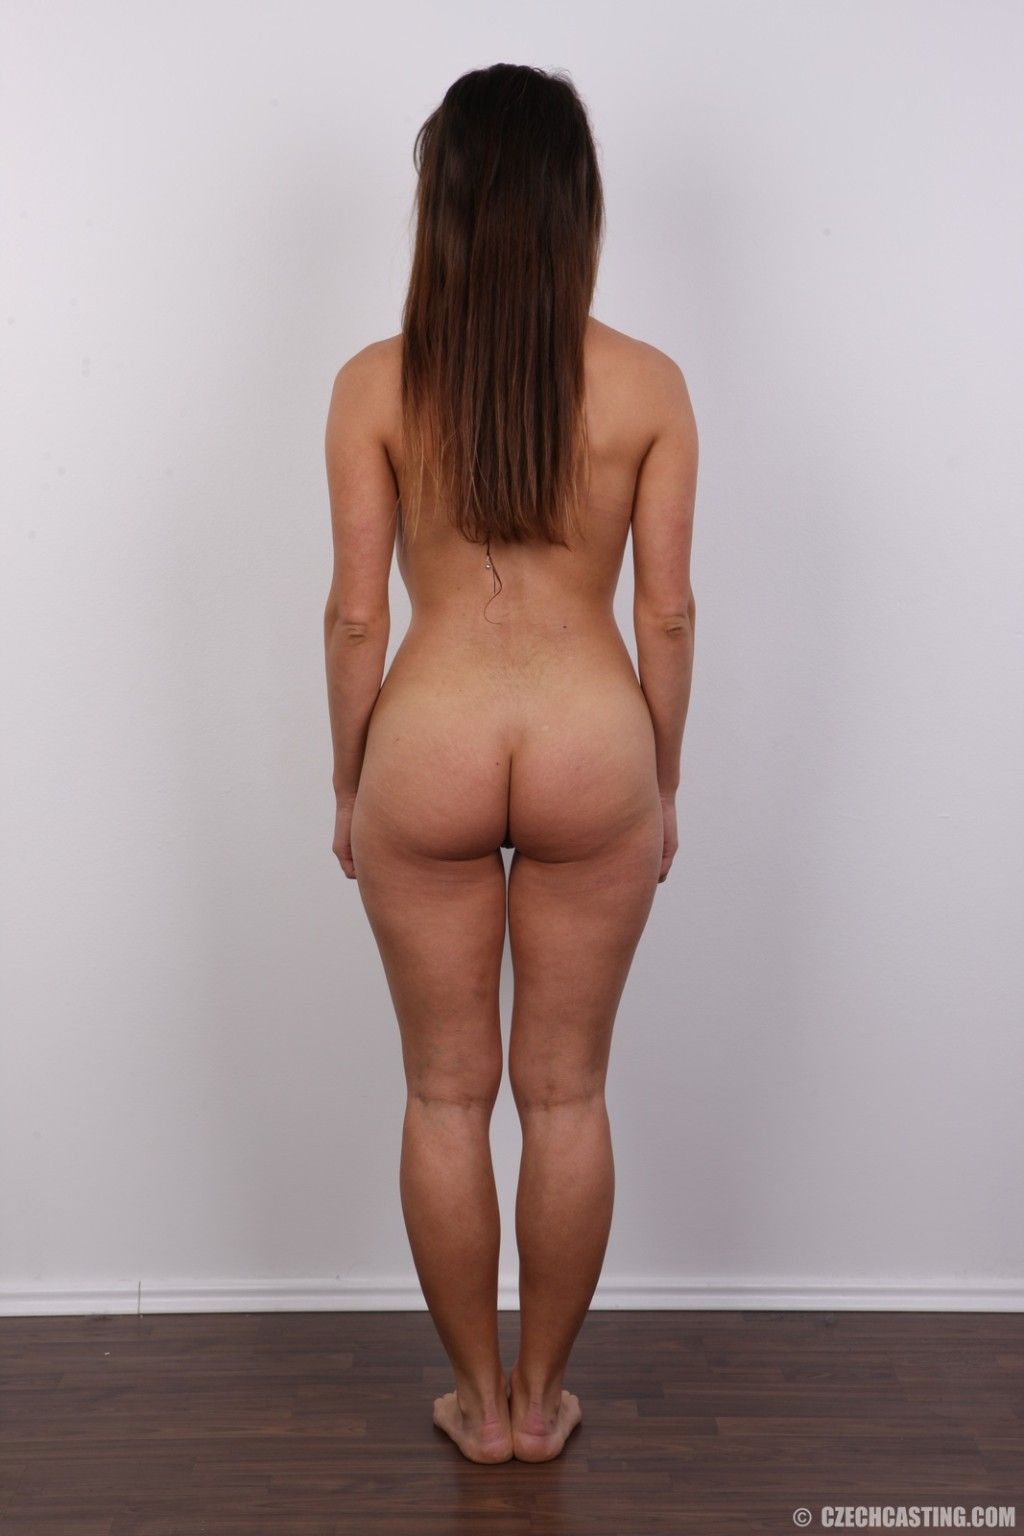 kurvige madchen nackt